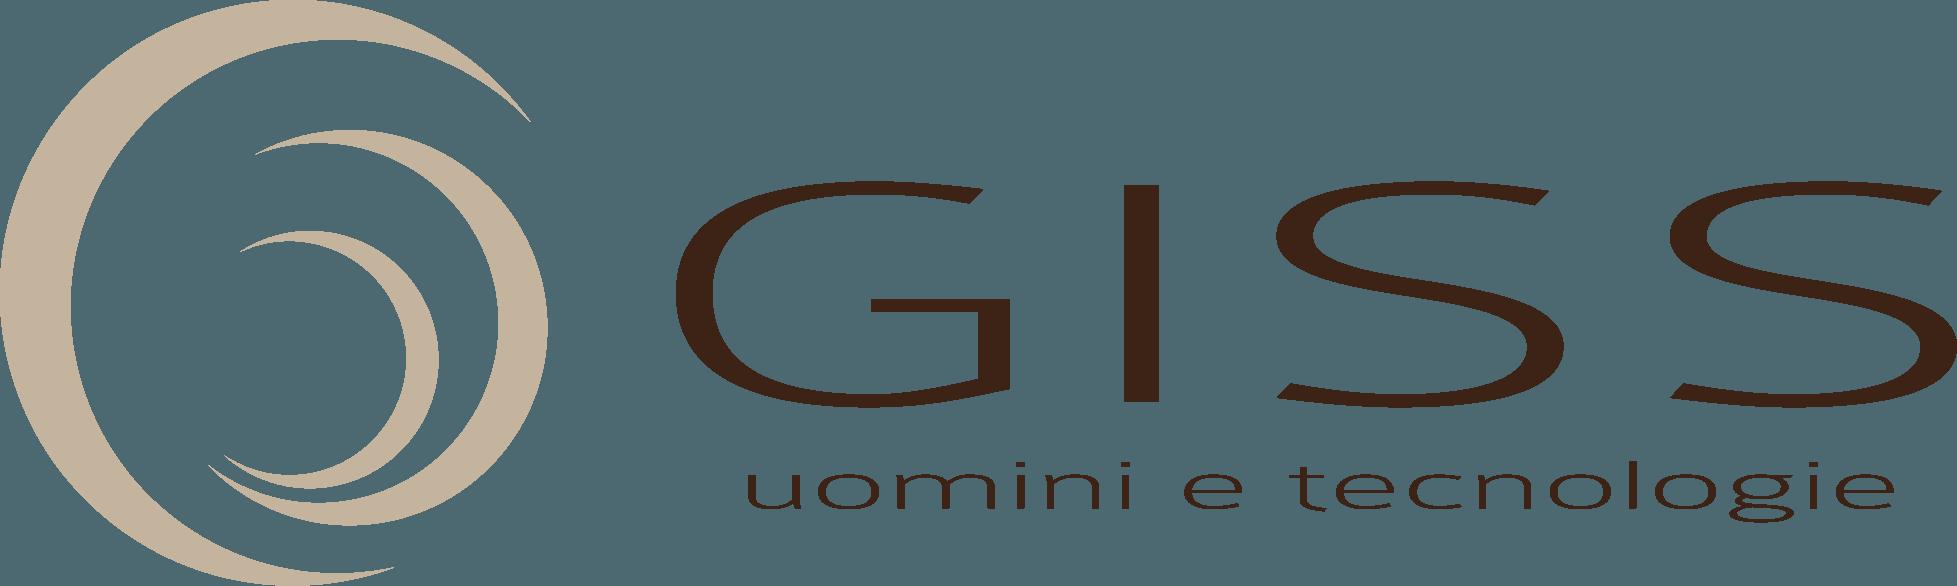 Giss - Logo